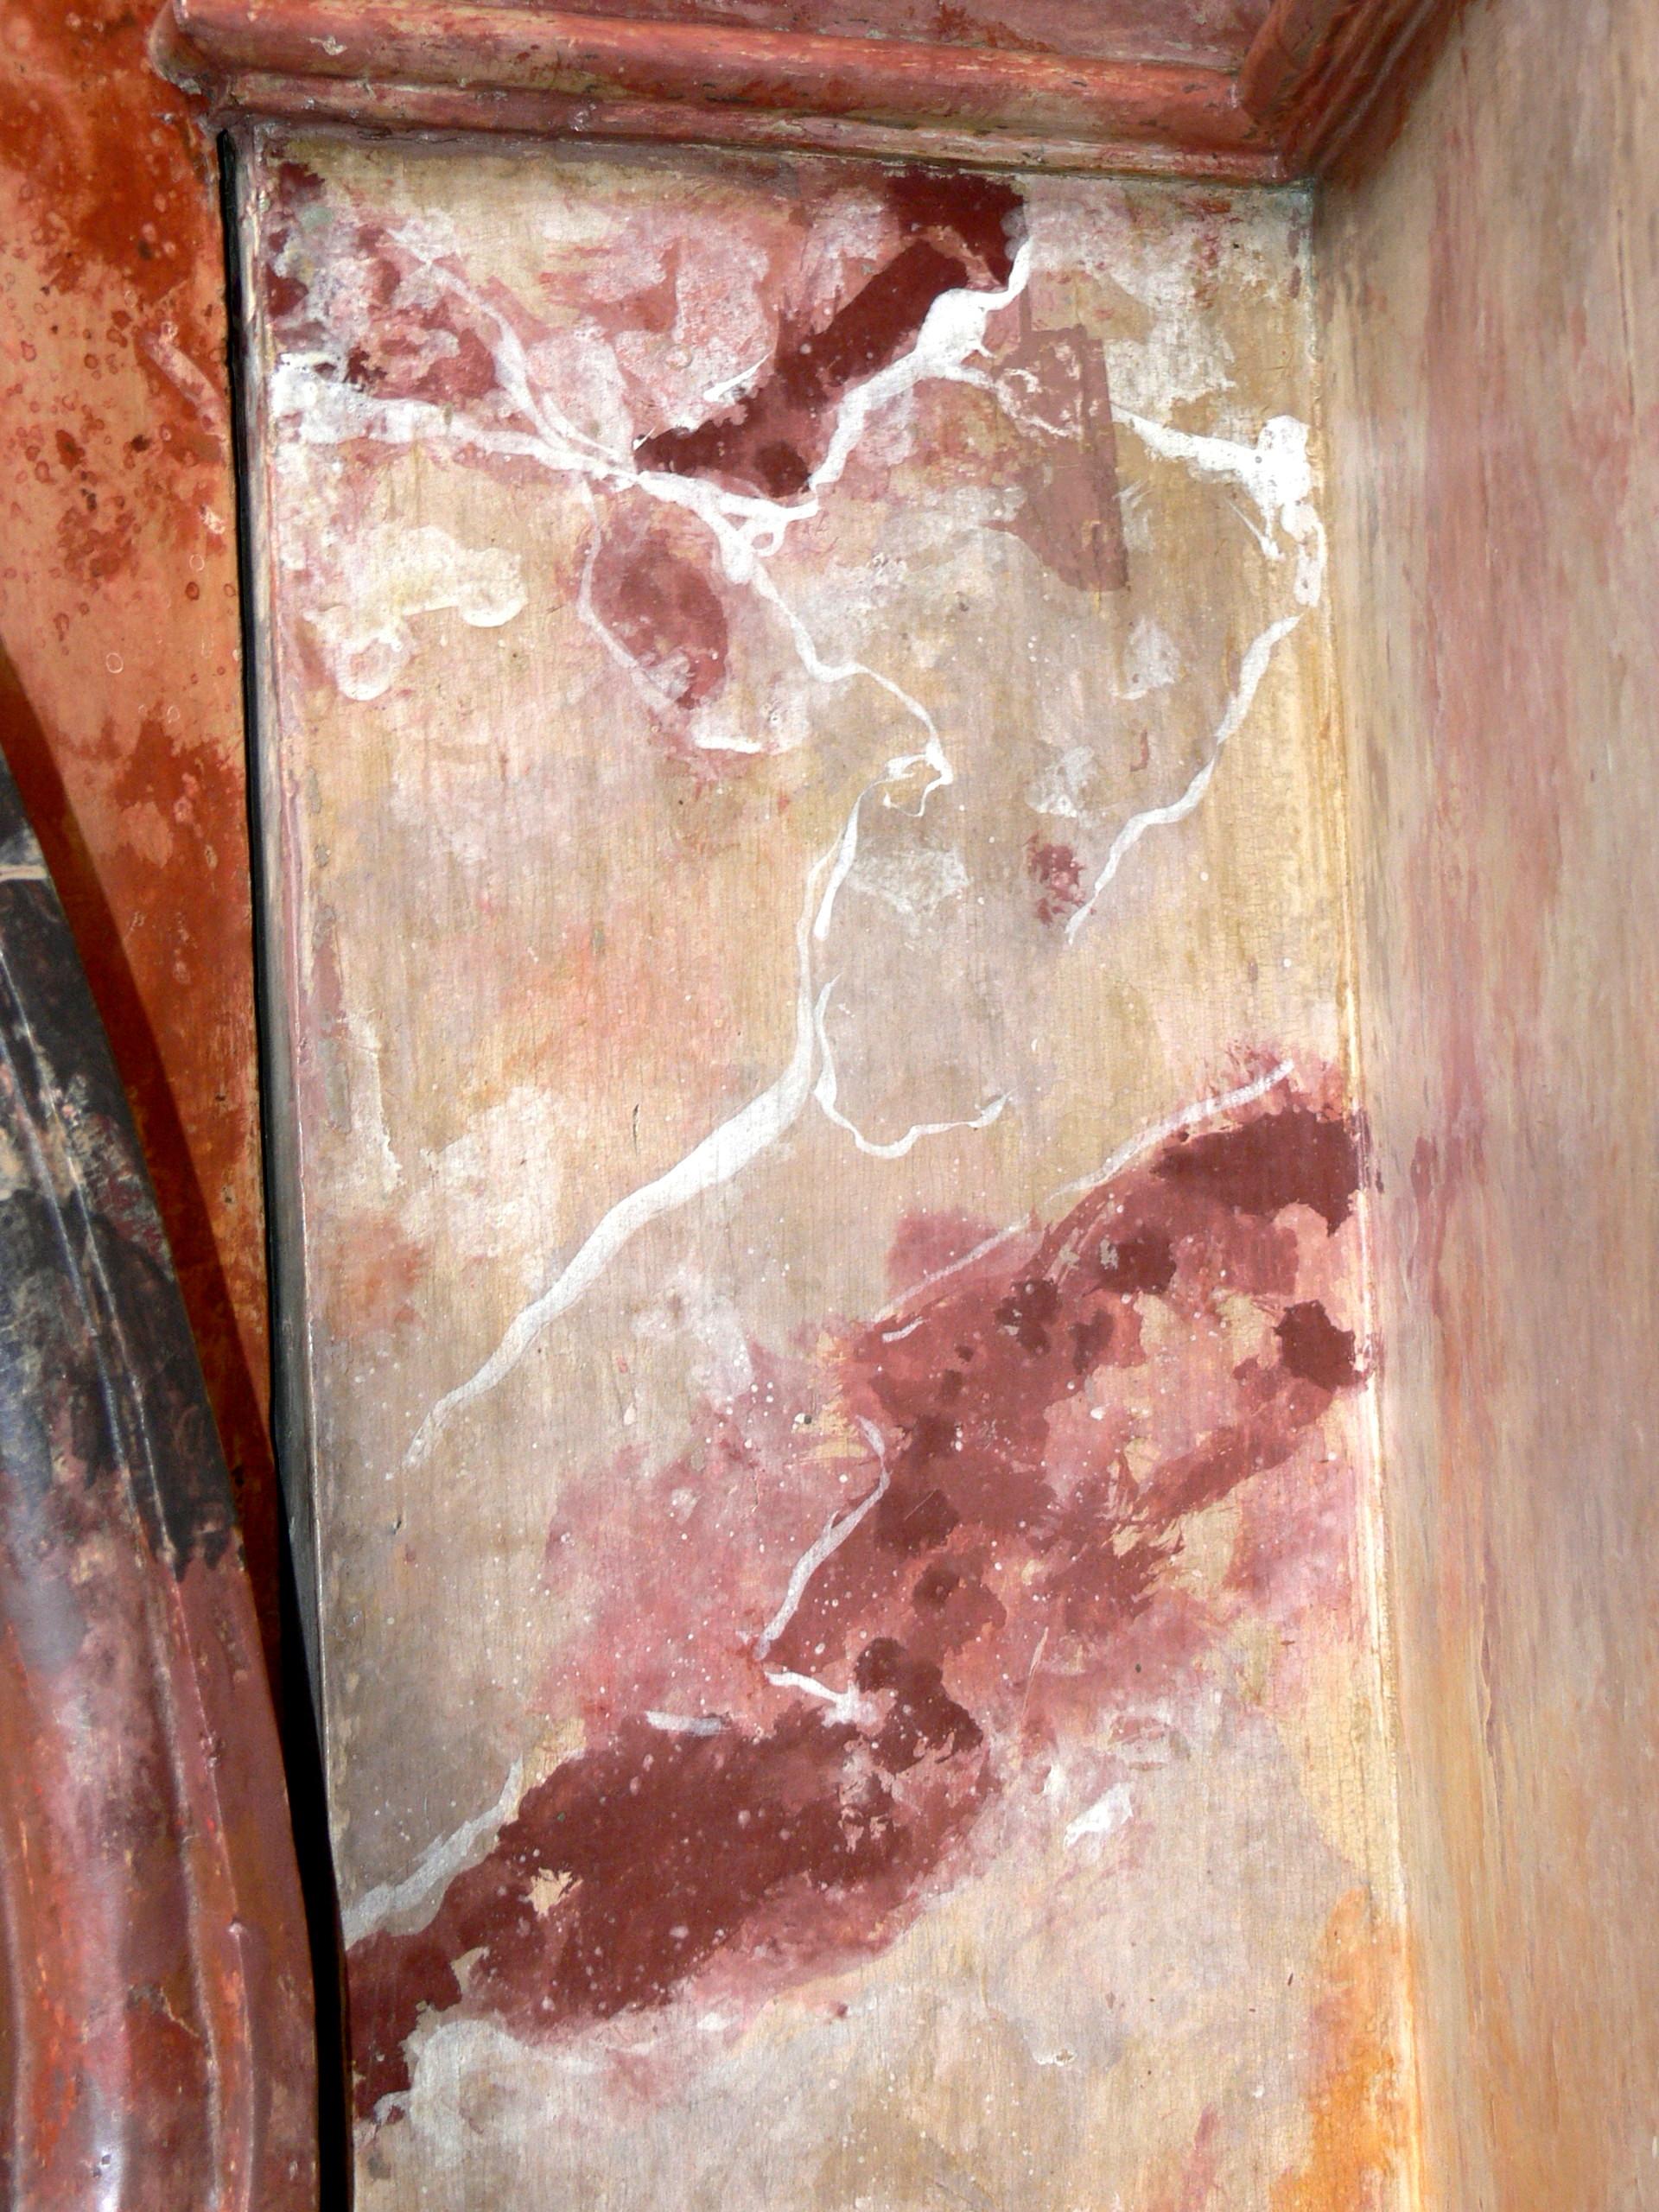 file sarleinsbach marienkapelle hochaltar marmorstuck 1. Black Bedroom Furniture Sets. Home Design Ideas